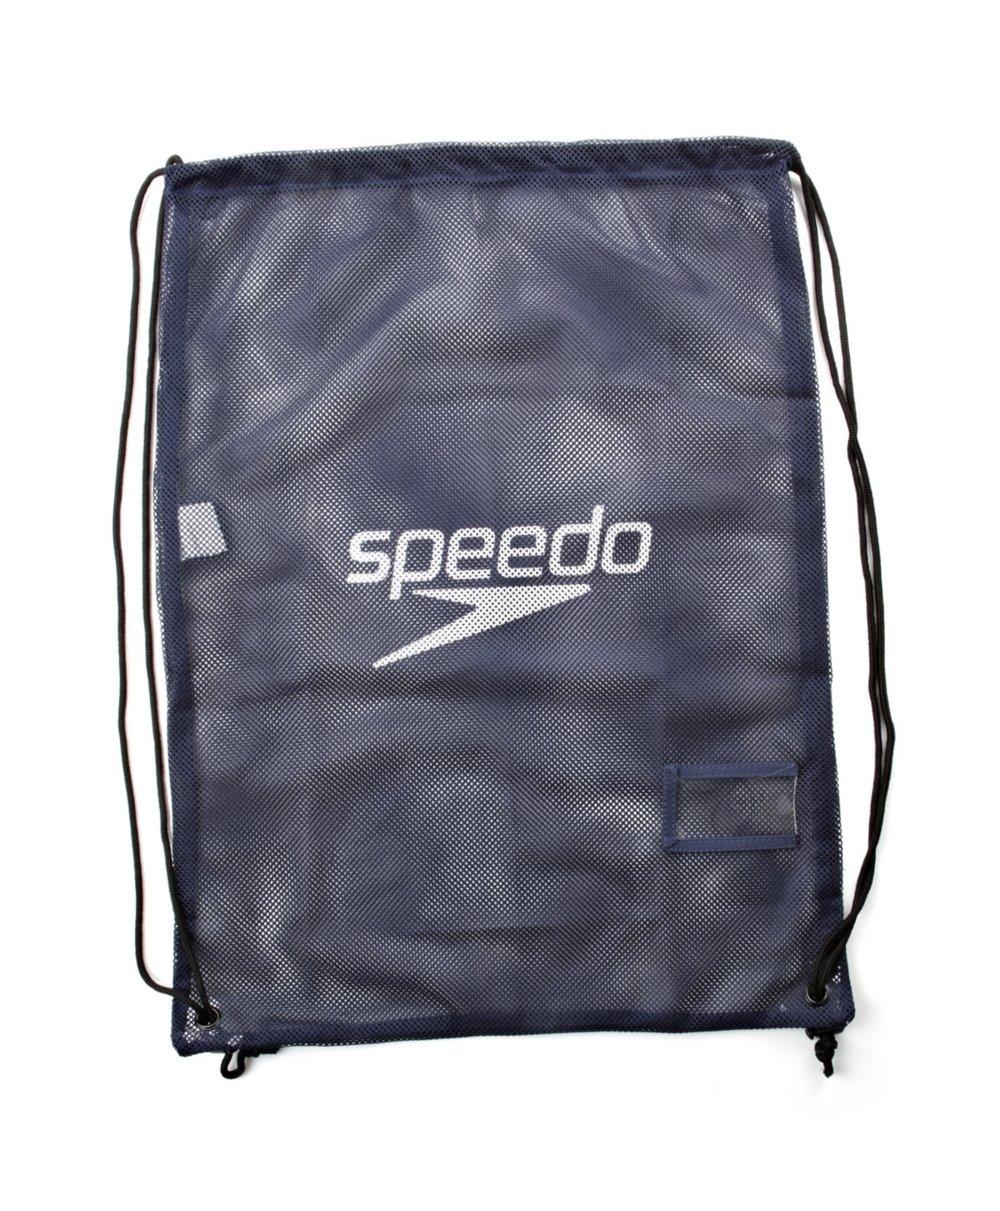 Marine Sac de natation Mixte Adulte Speedo Equipment Mesh 35 l